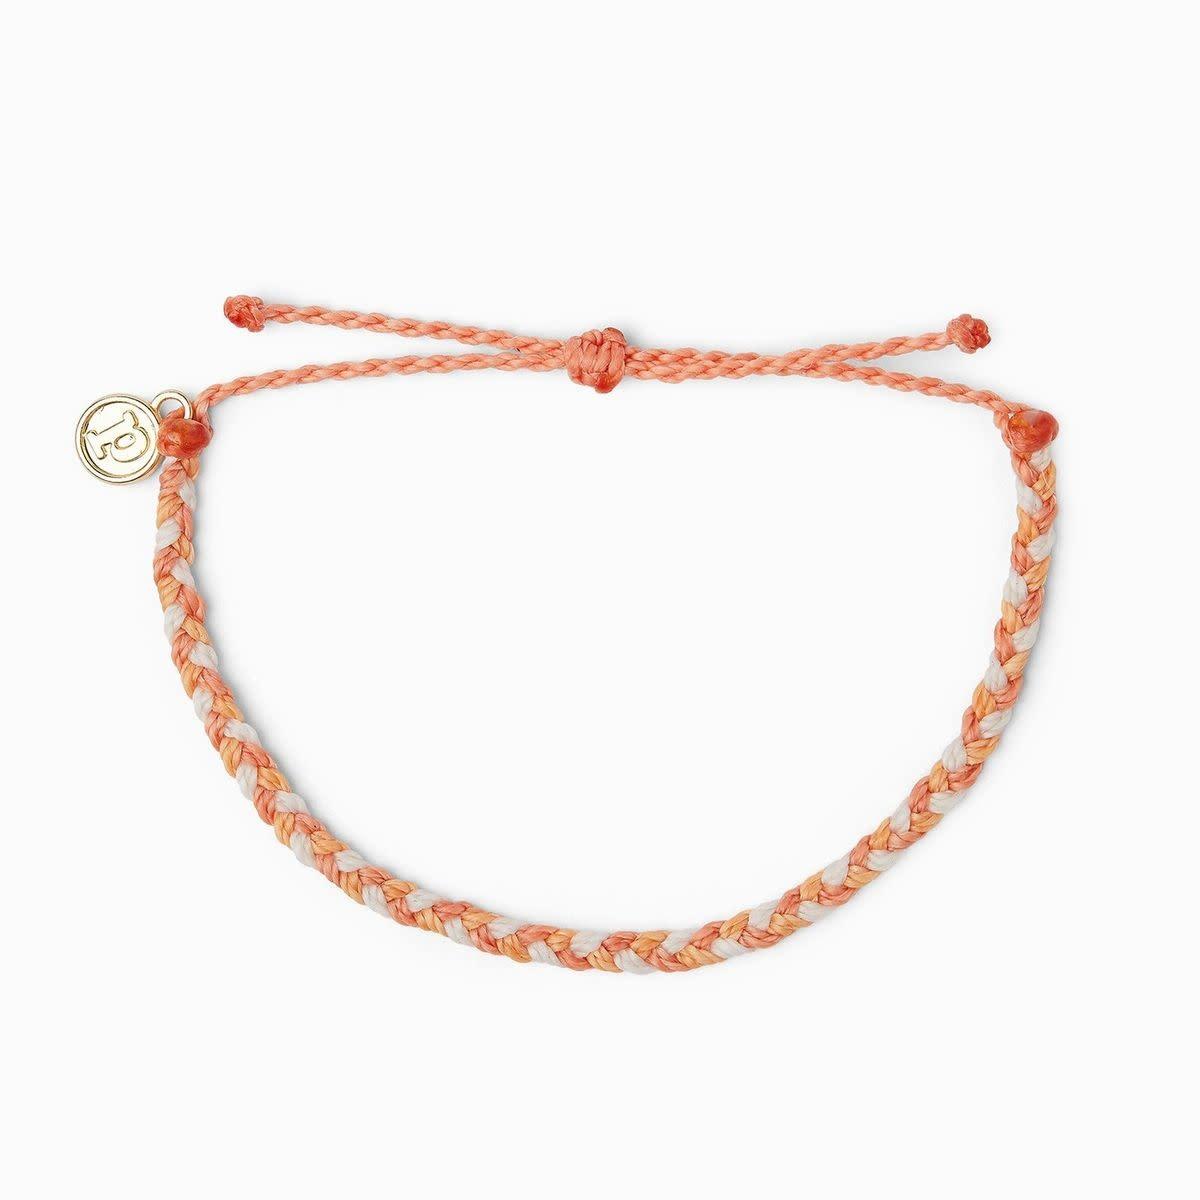 Warm Shoreline Braided Bracelet